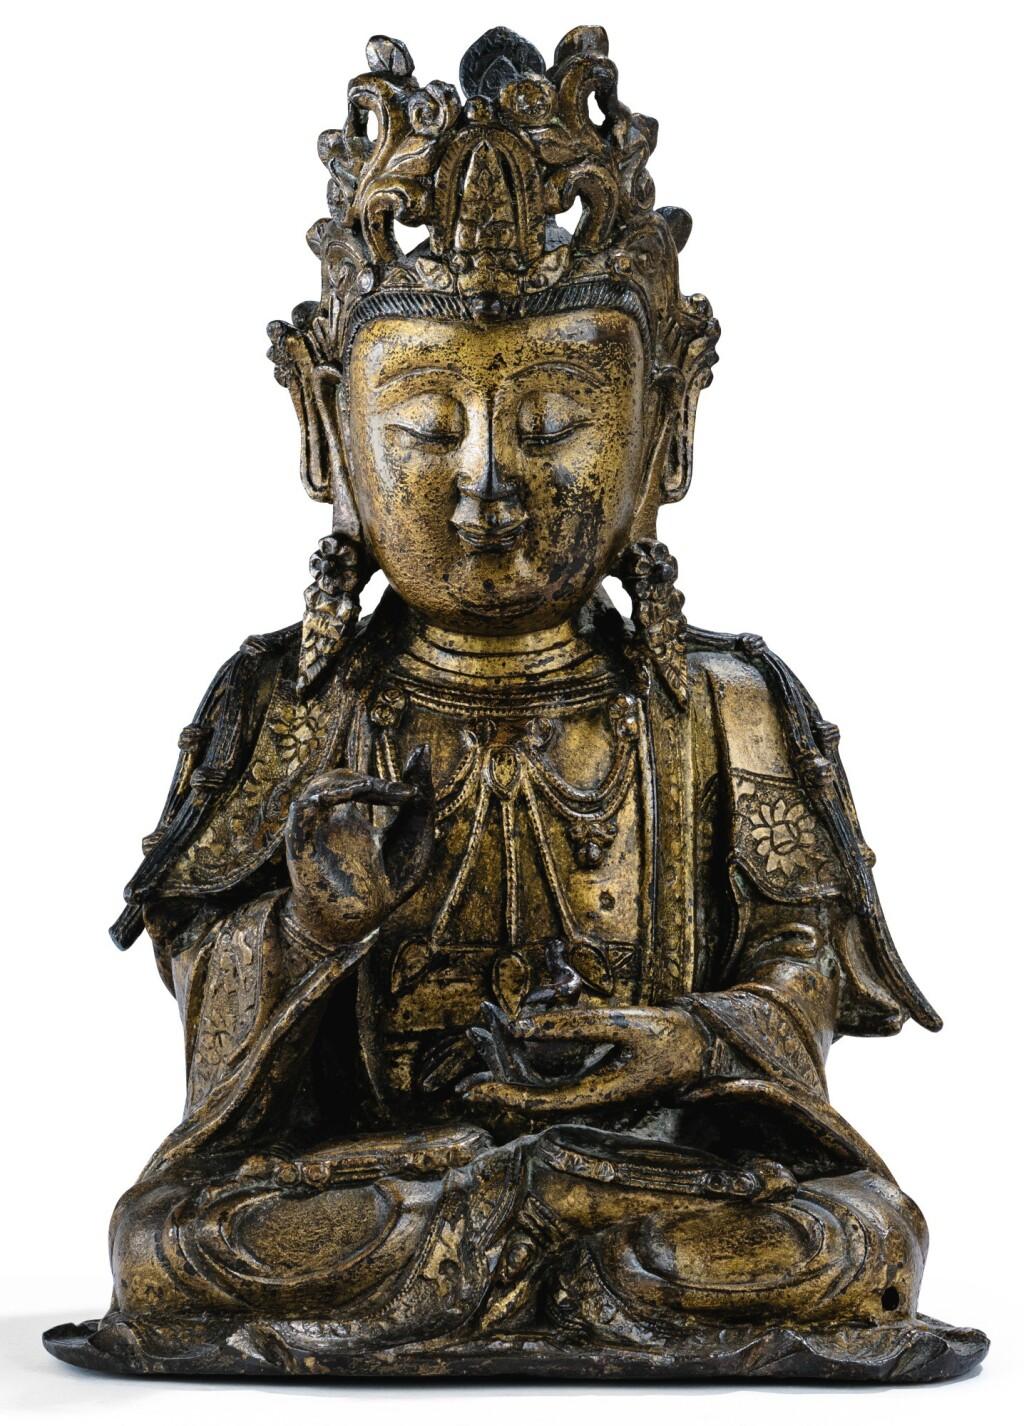 STATUETTE DE GUANYIN EN BRONZE LAQUÉ OR DYNASTIE MING | 明 漆金銅觀音坐像 | A lacquer-gilt figure of Guanyin, Ming Dynasty